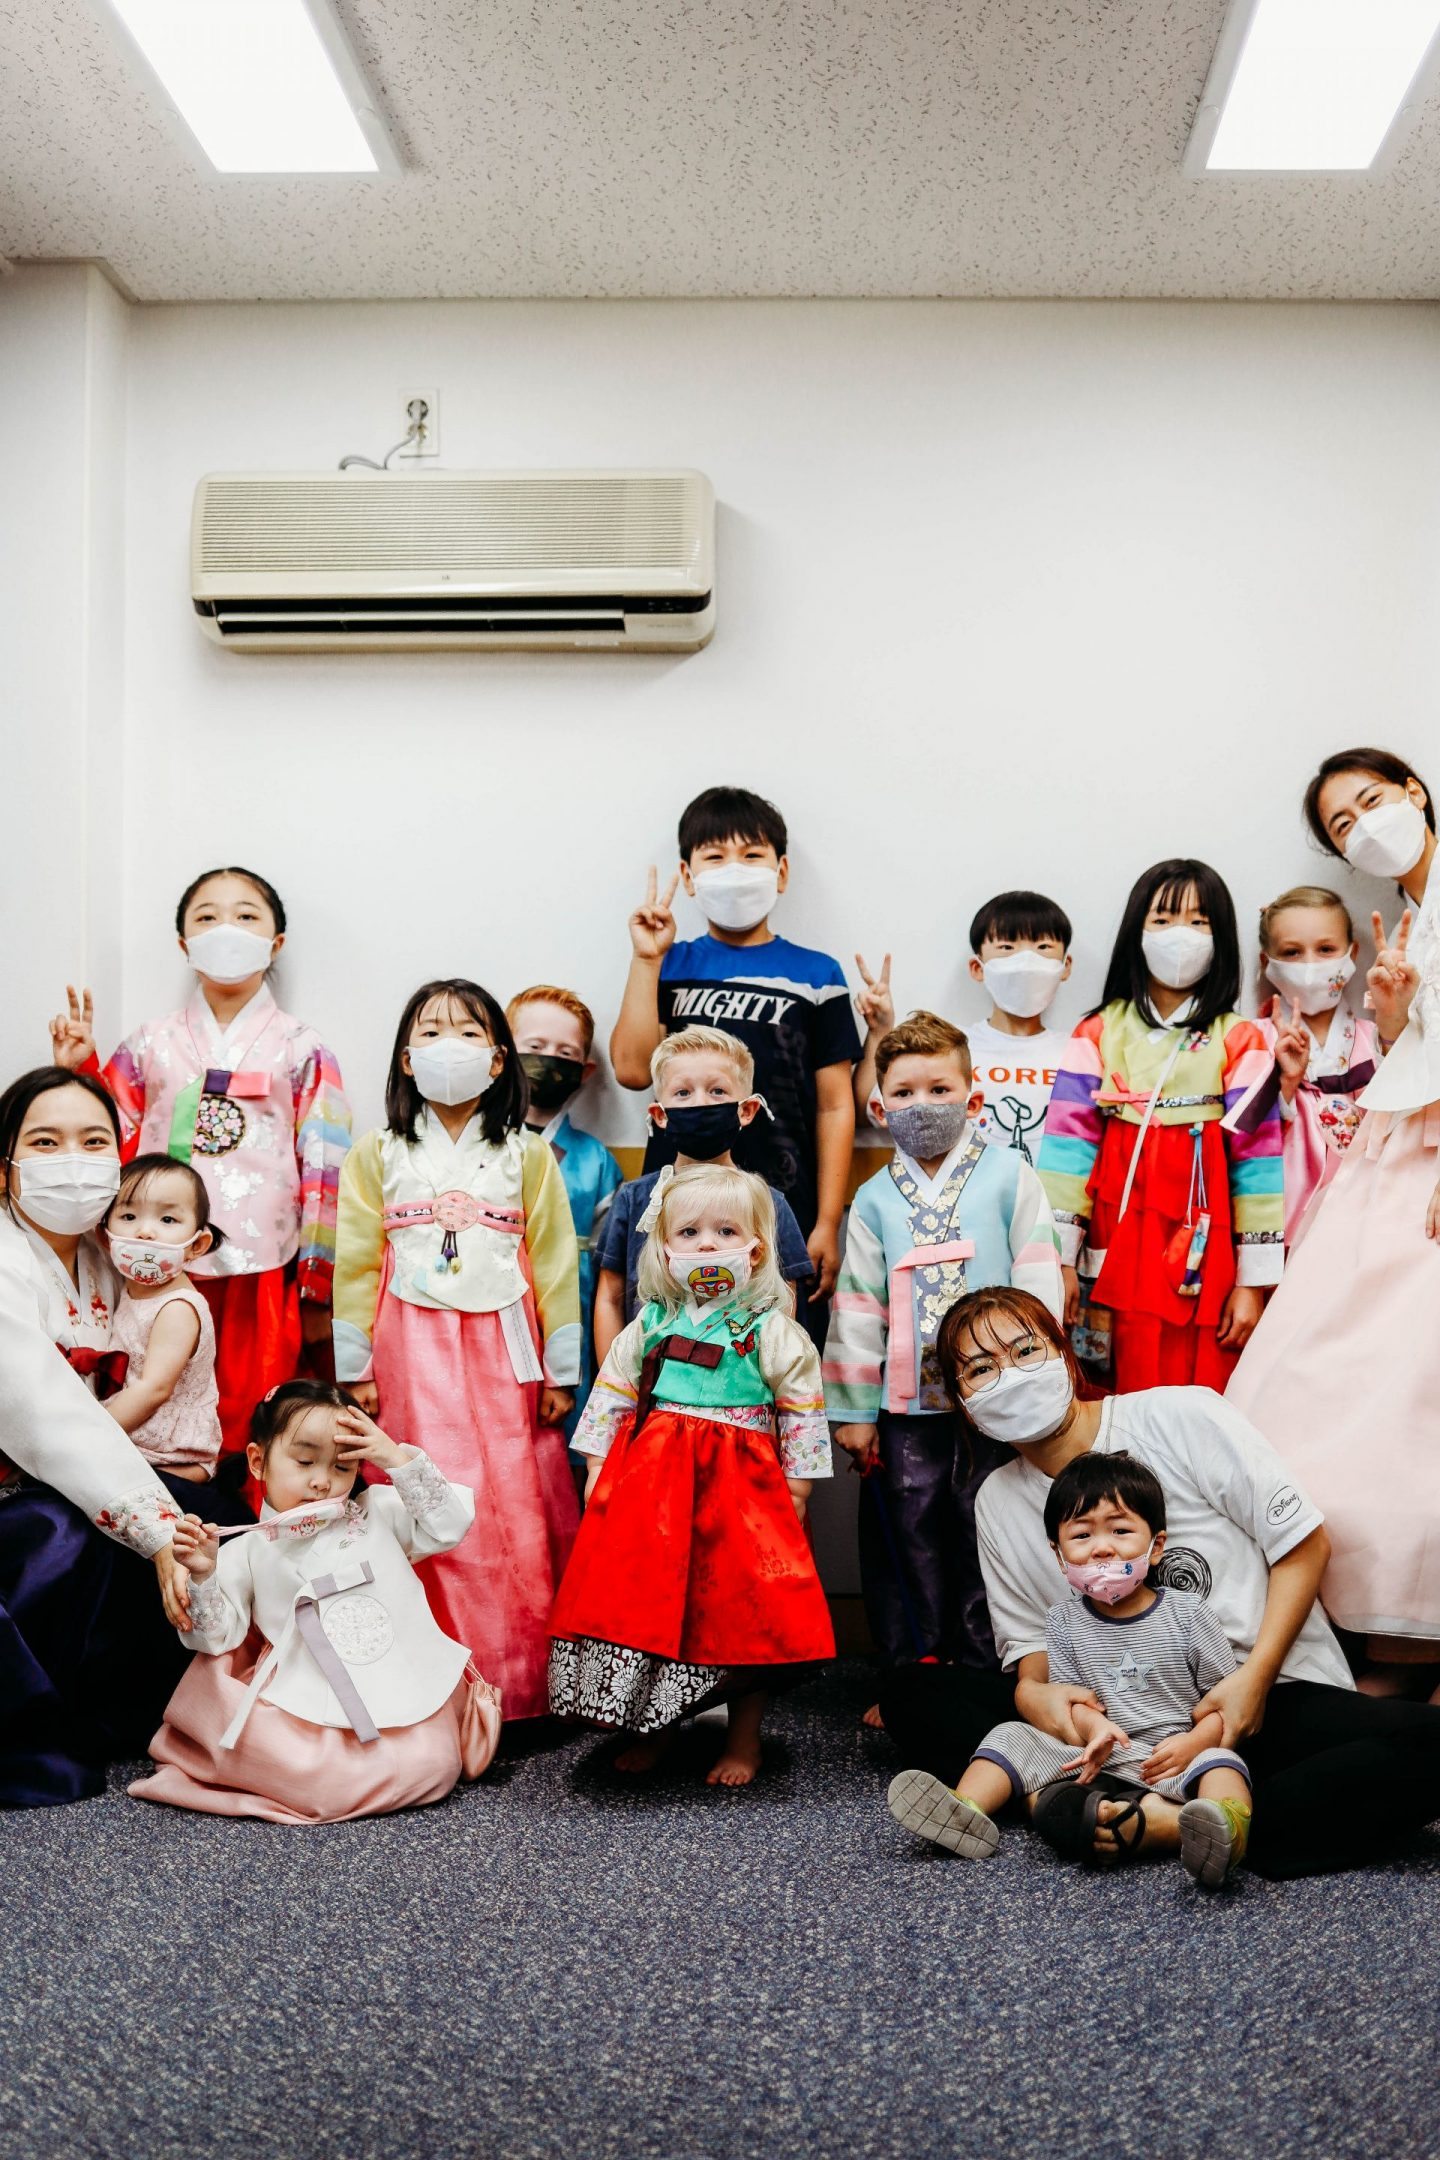 chuseok celebrations south korea 2021